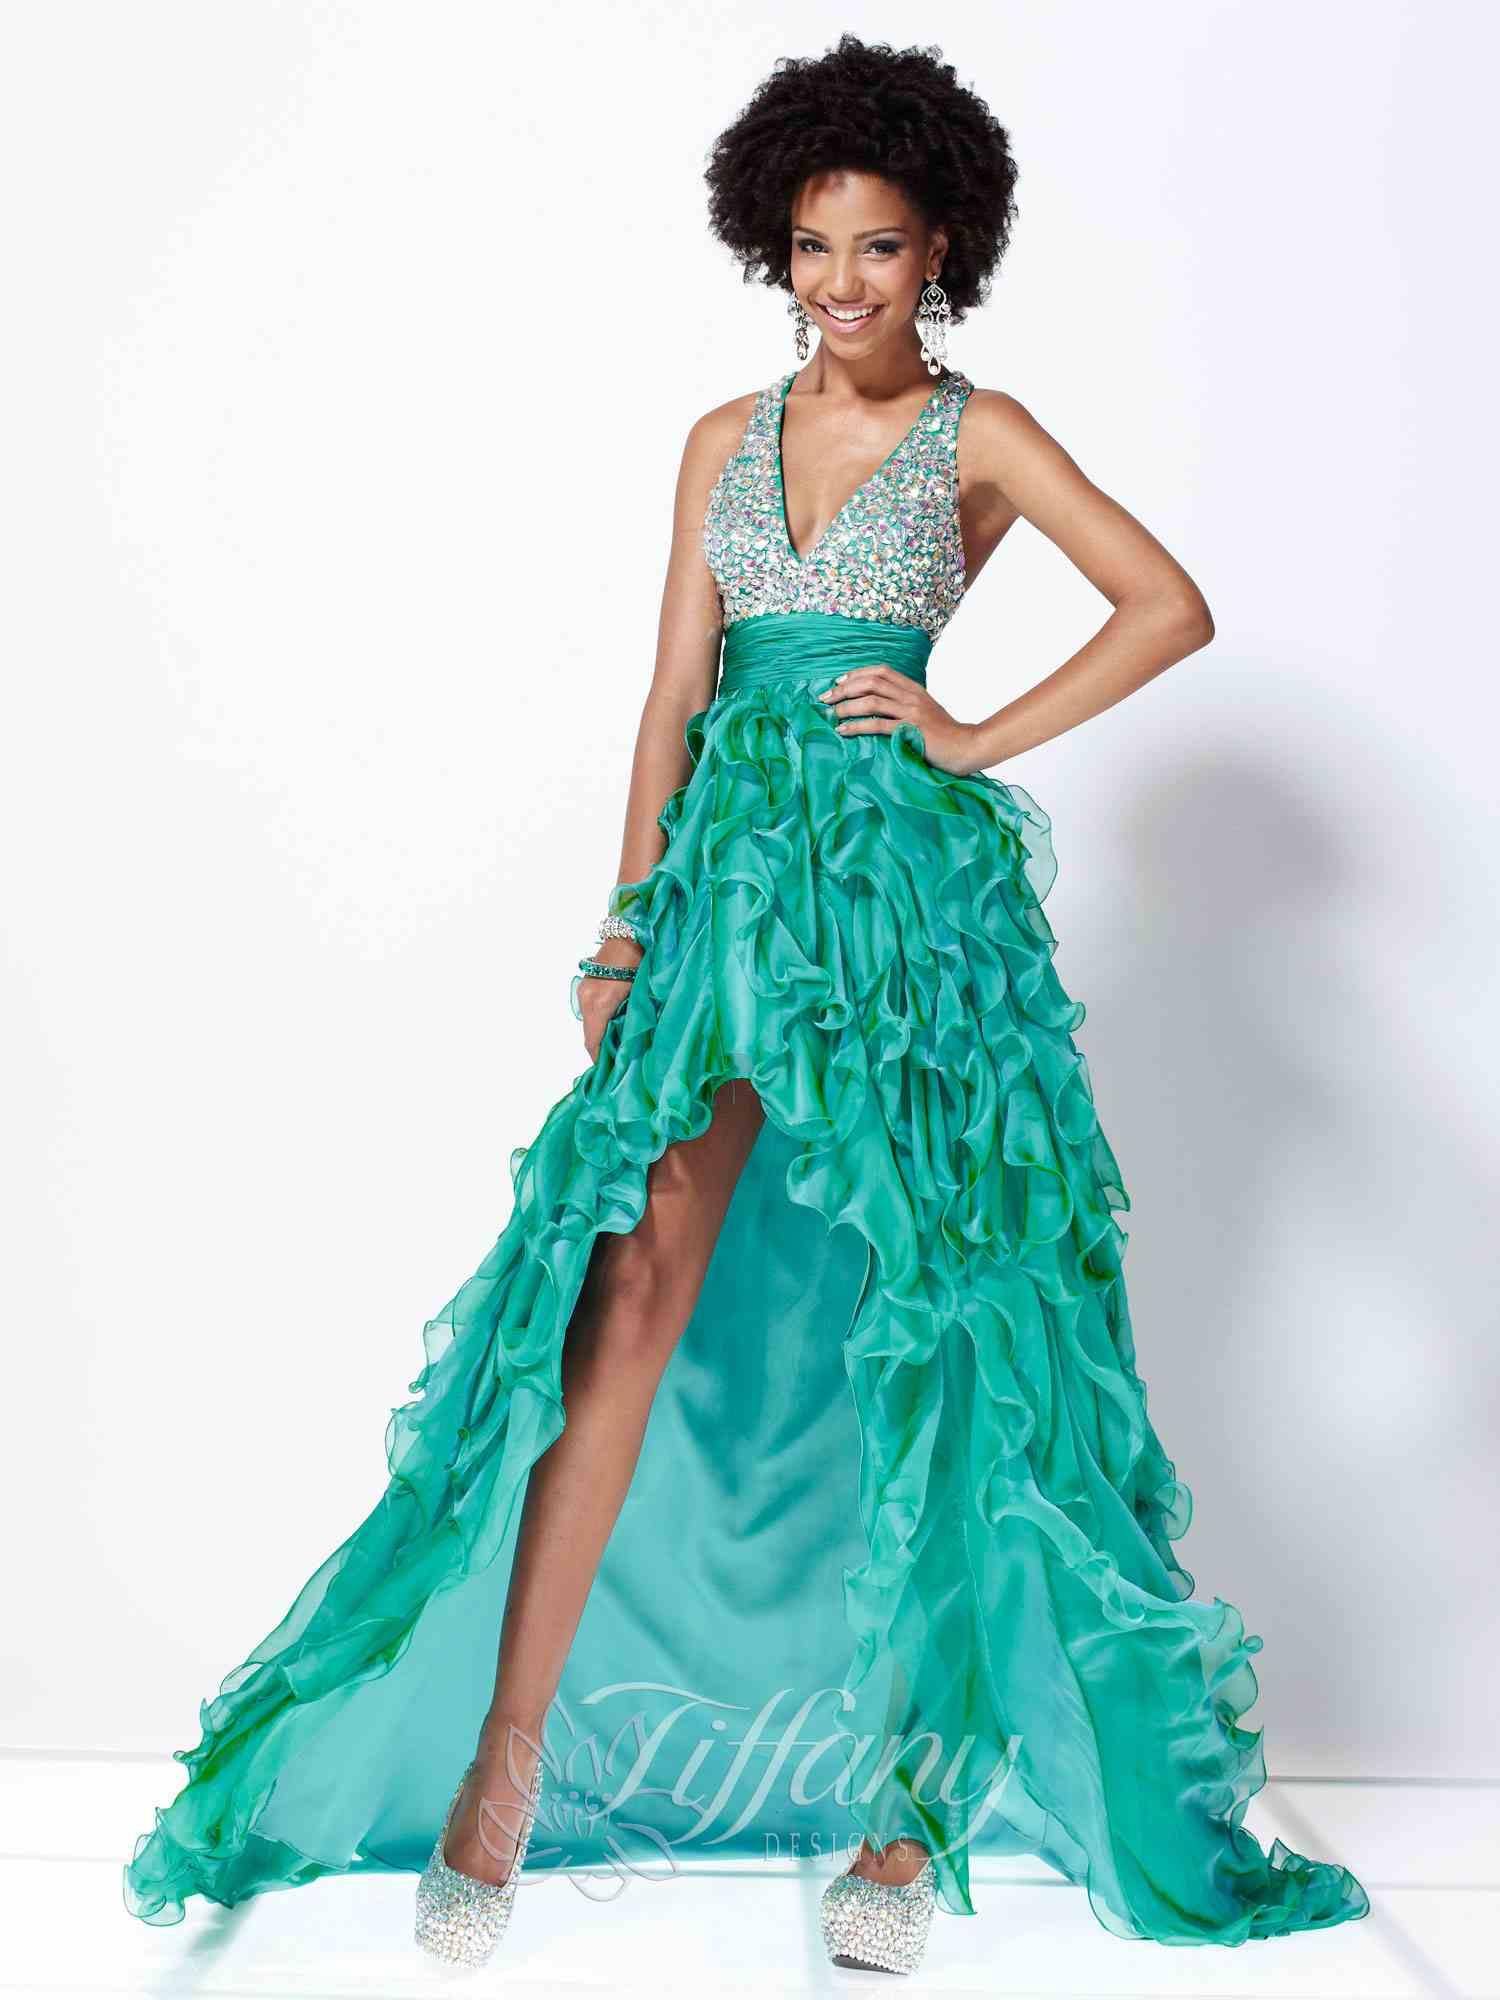 Teal Prom Dresses 2013 Tiffany Prom Dresses 2013